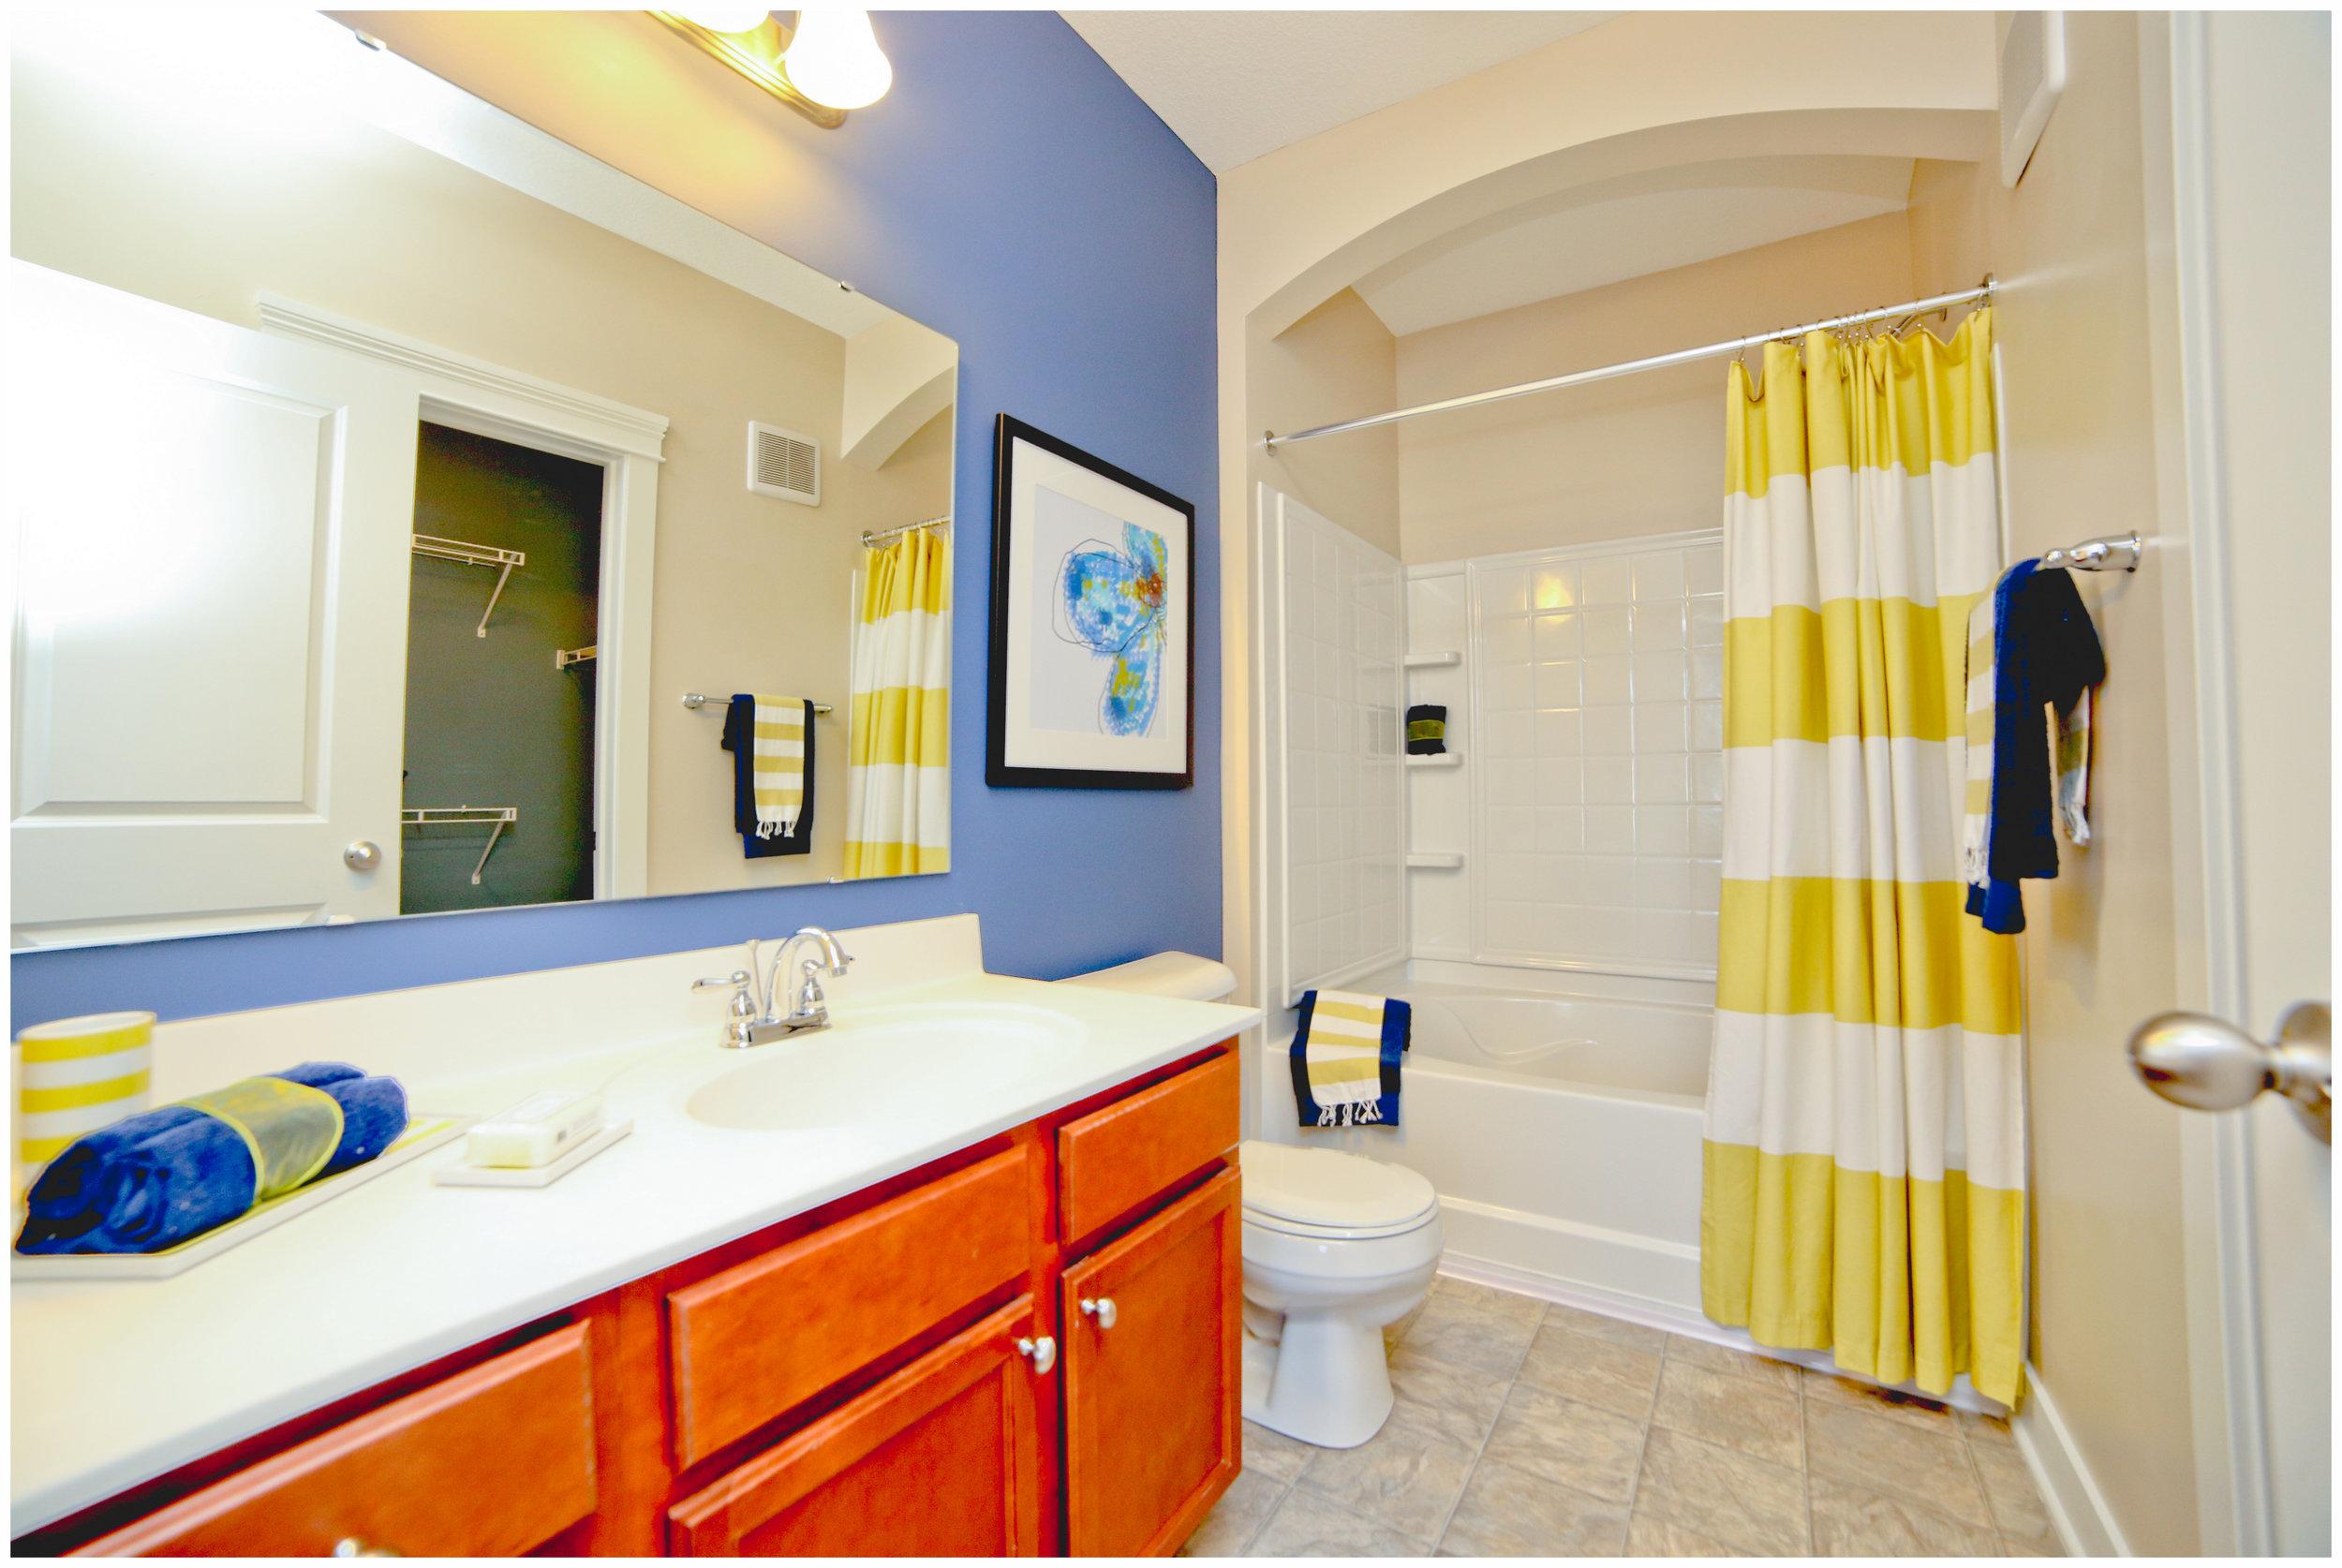 USF - model bathroom 1 (apartment).jpg